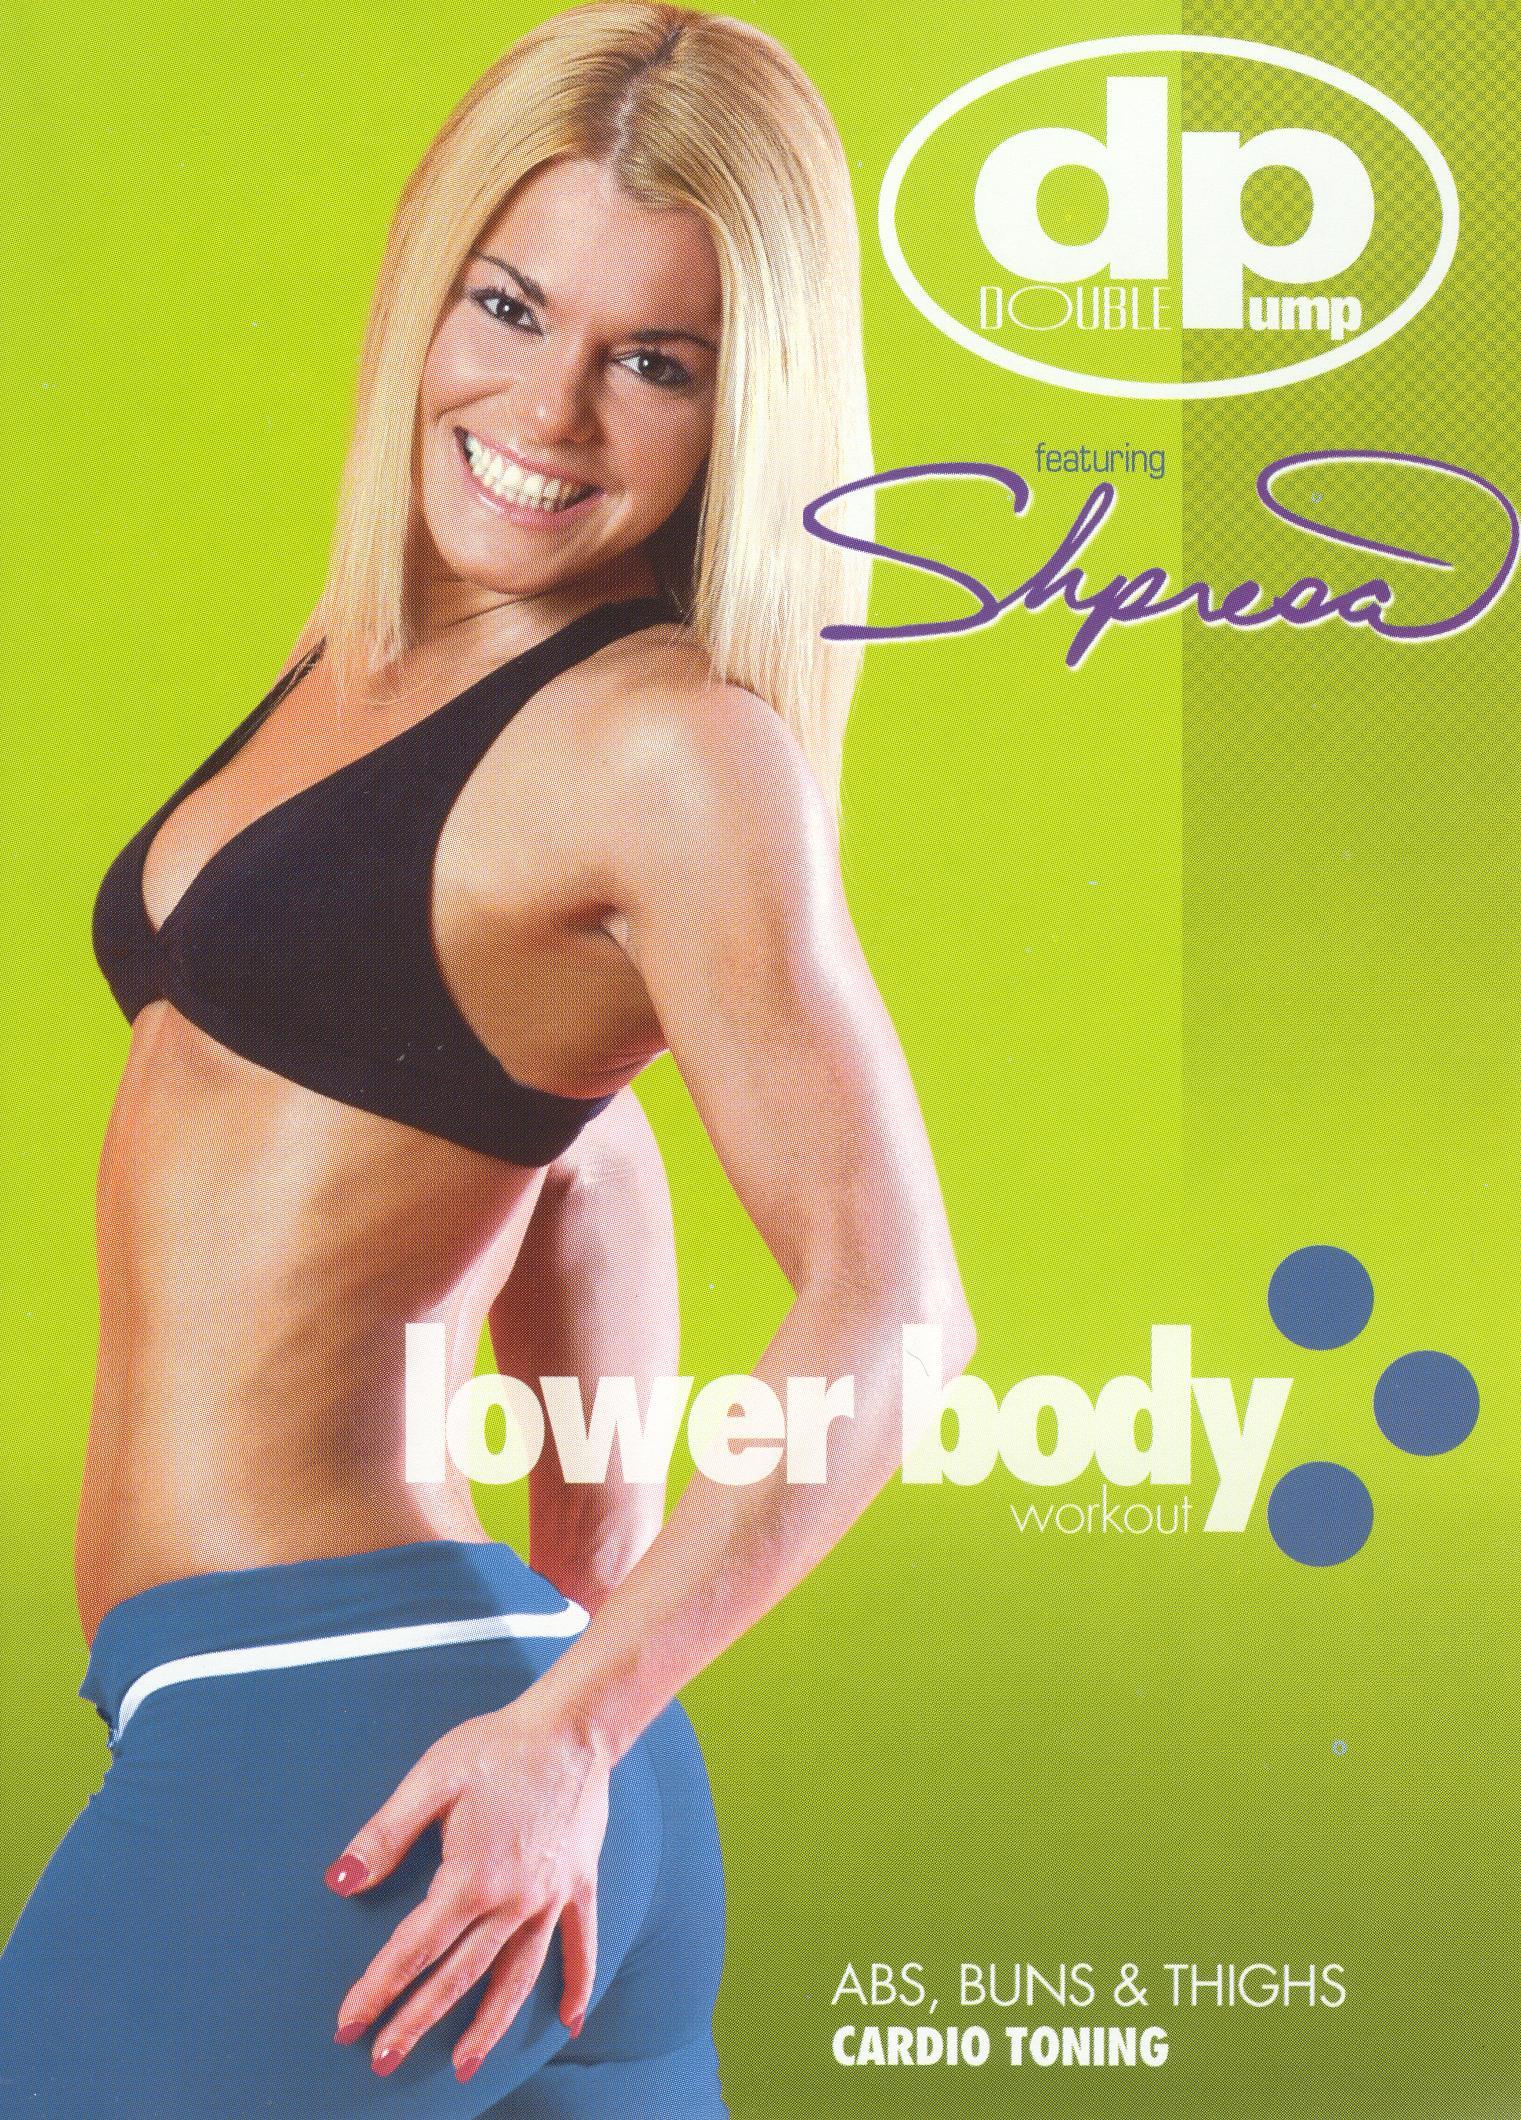 Double Pump: Lower Body